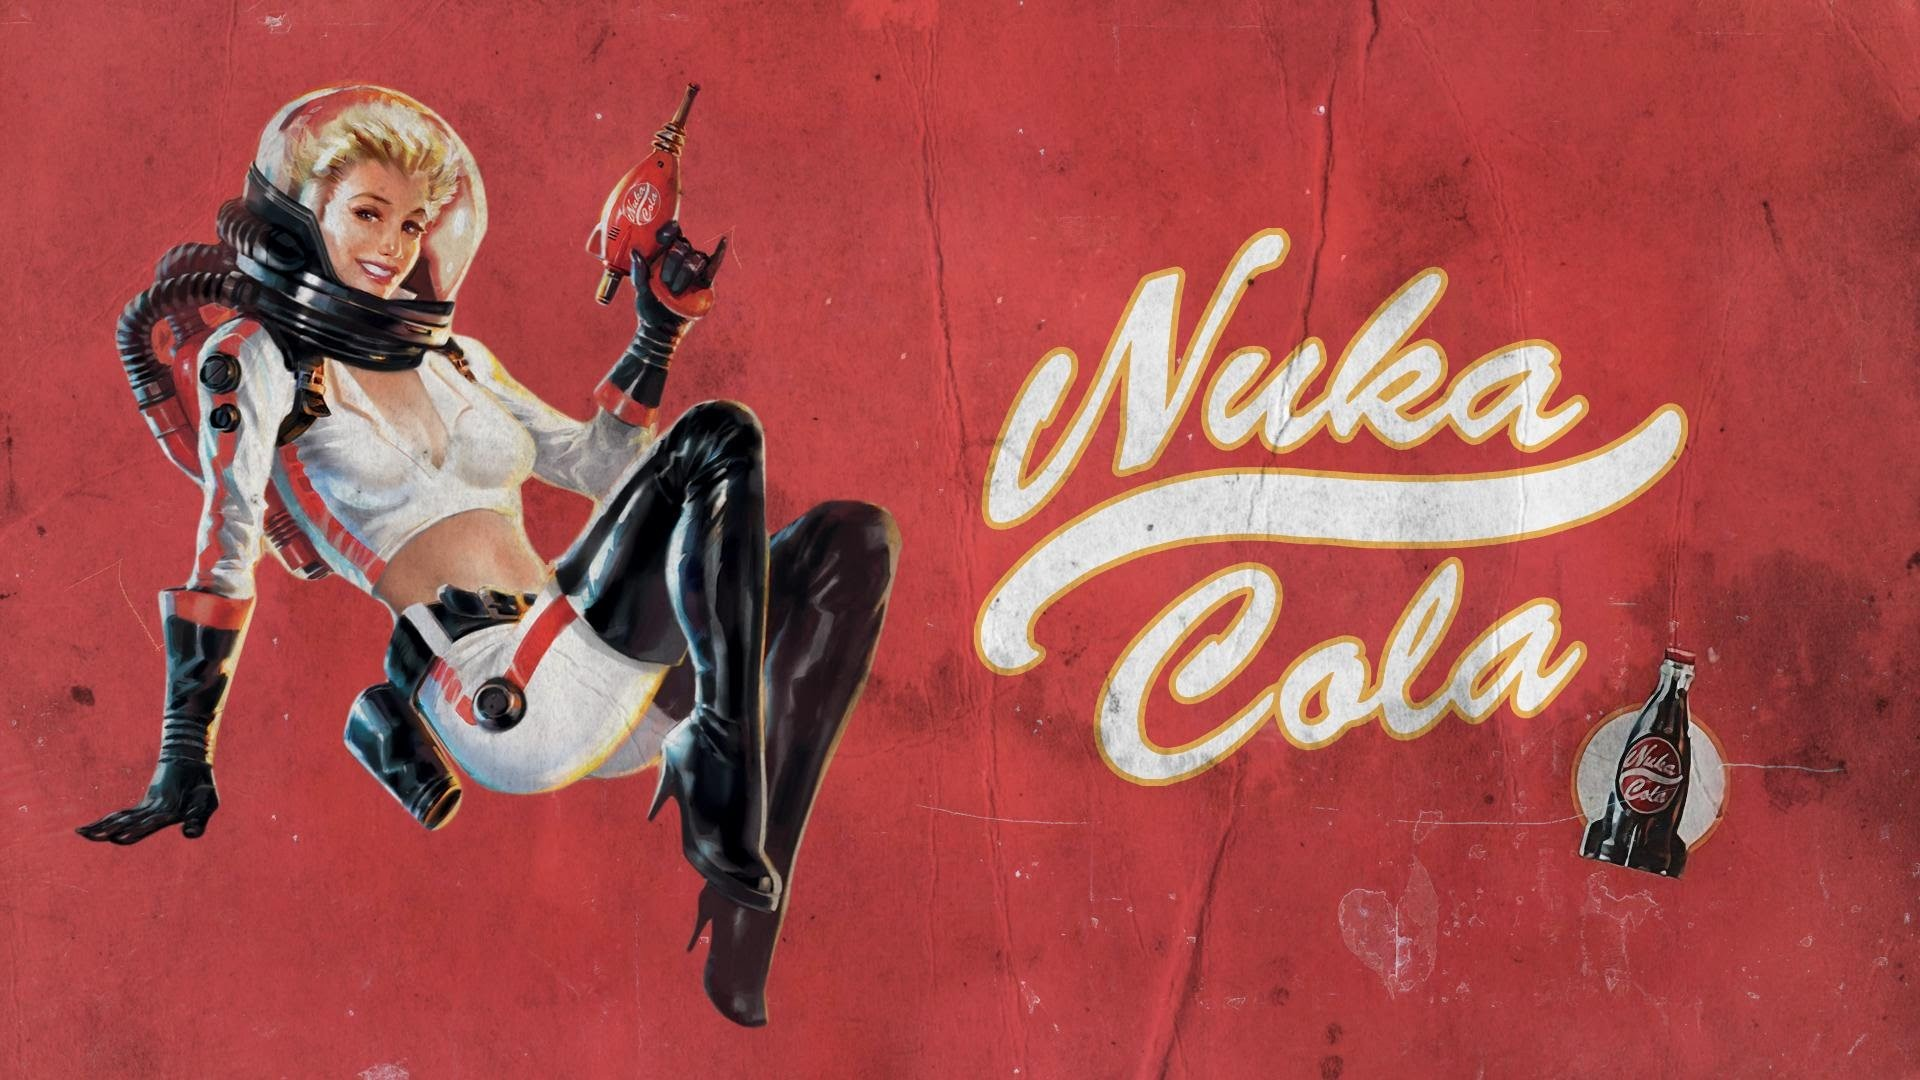 General Nuka Cola pinup models vault girl Fallout 4 video games